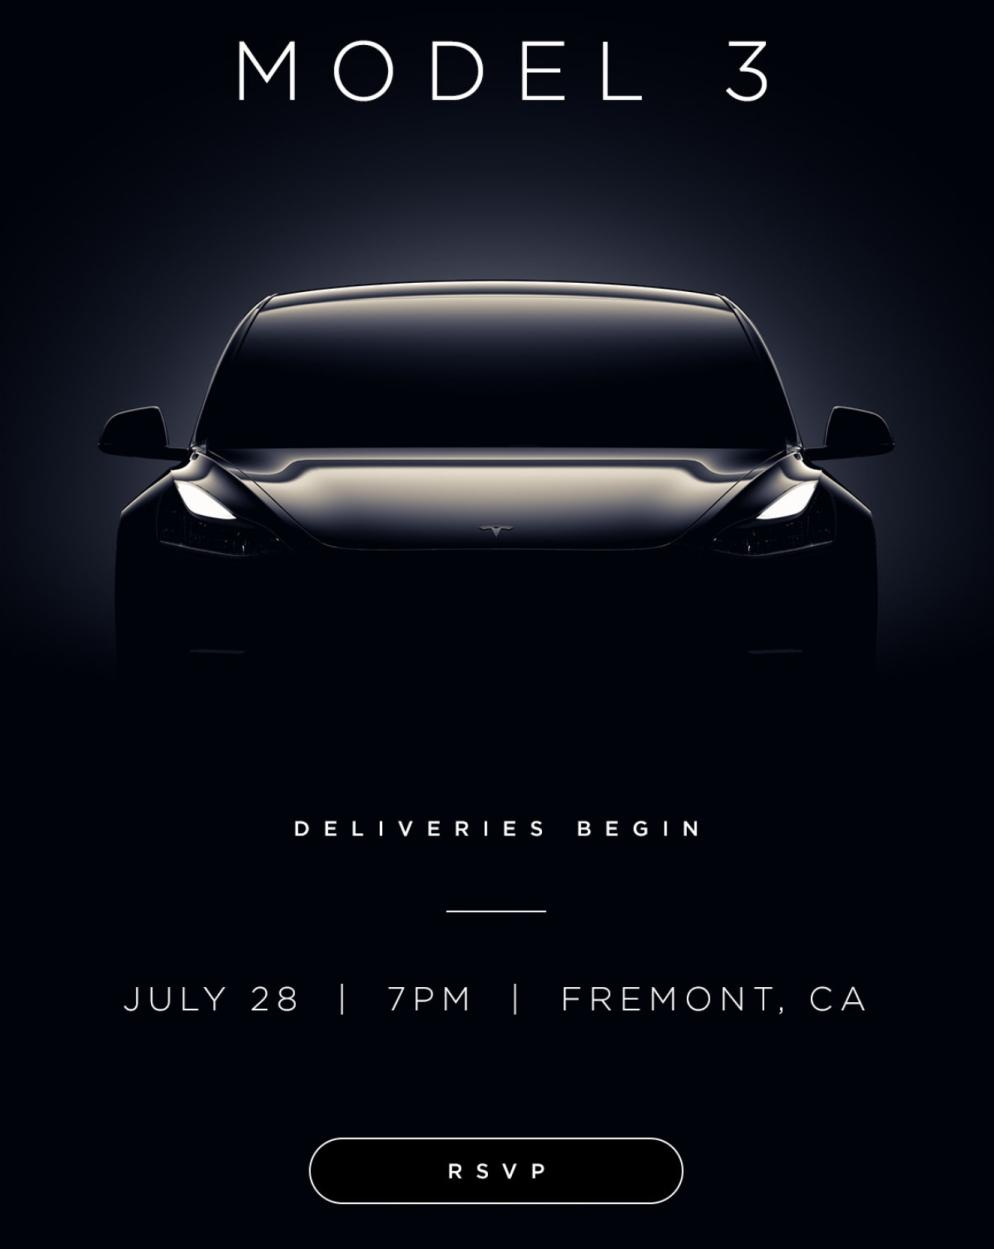 Tesla Model 3 delivery event invite